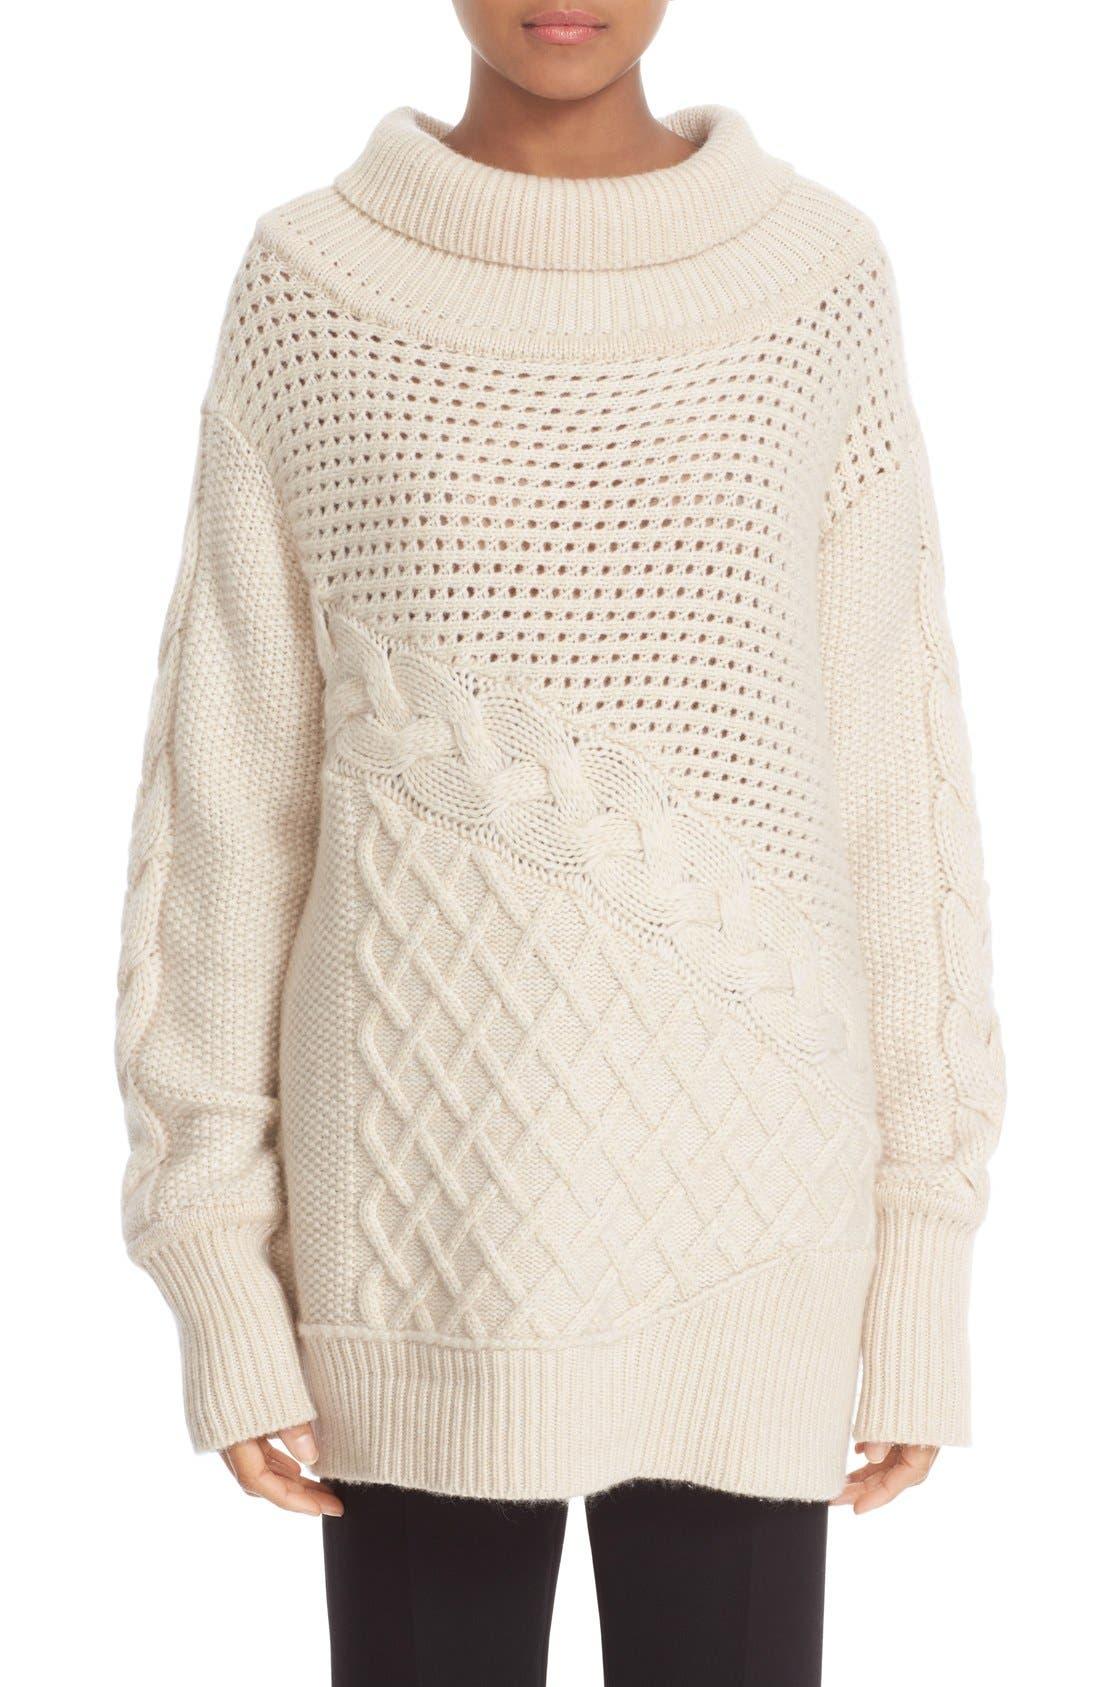 PRABAL GURUNG, Cable Knit Cashmere Sweater, Main thumbnail 1, color, 904